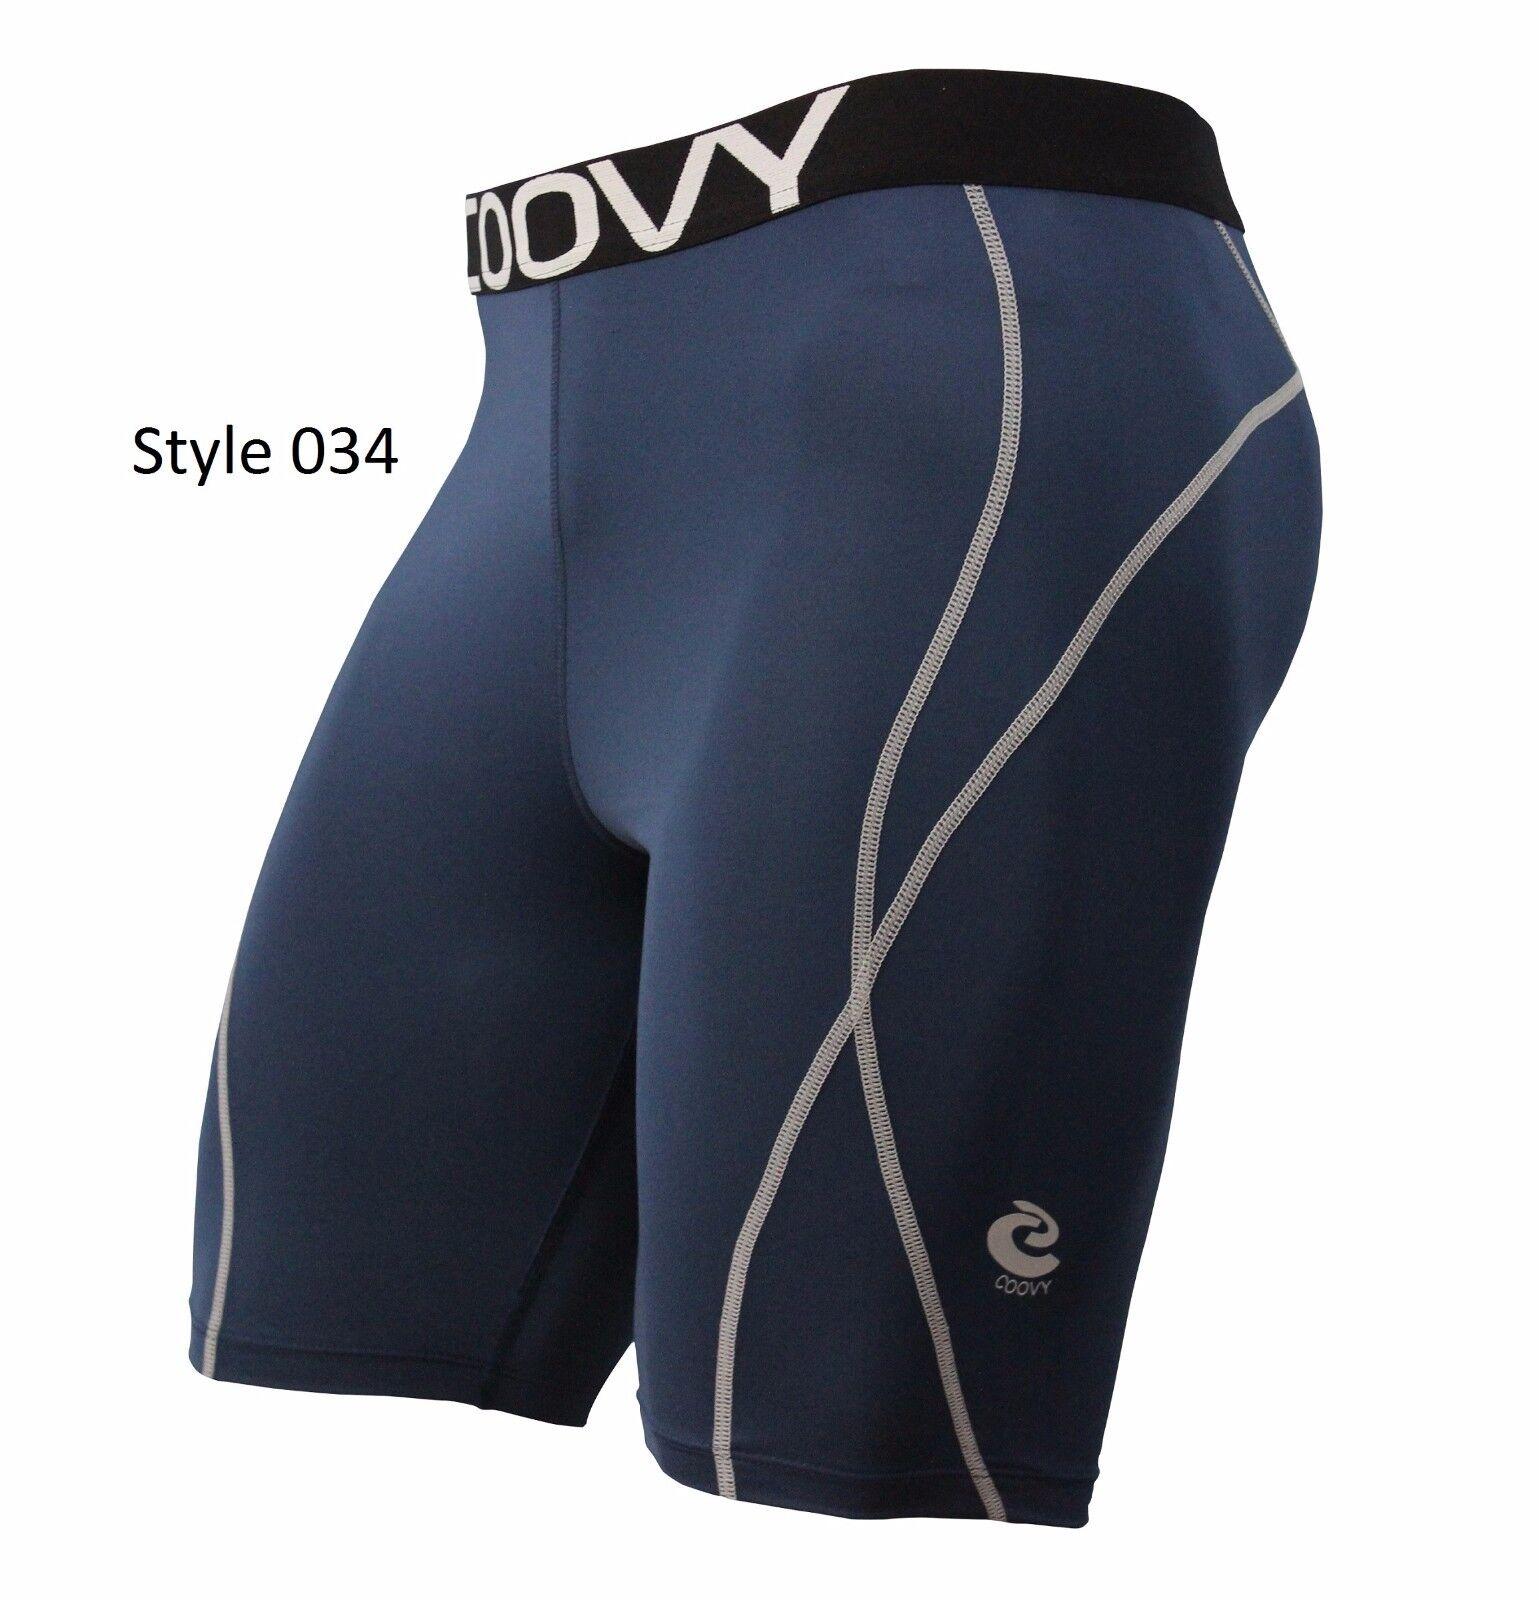 034B Midweight Navy Shorts